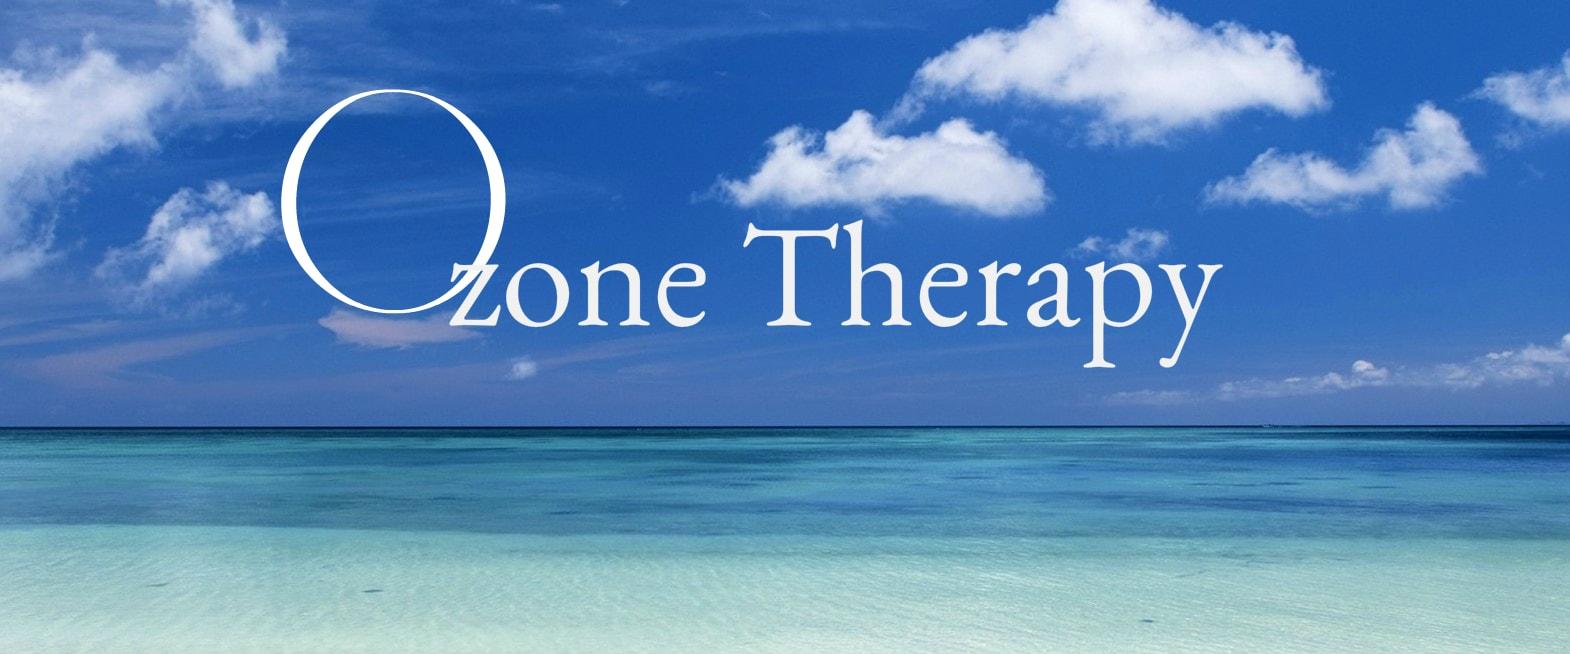 Wallcoo_com_Japan_Okinawa_sky_beach_Okinawa_JY126_350A american regenerative clinic Home Wallcoo com Japan Okinawa sky beach Okinawa JY126 350A